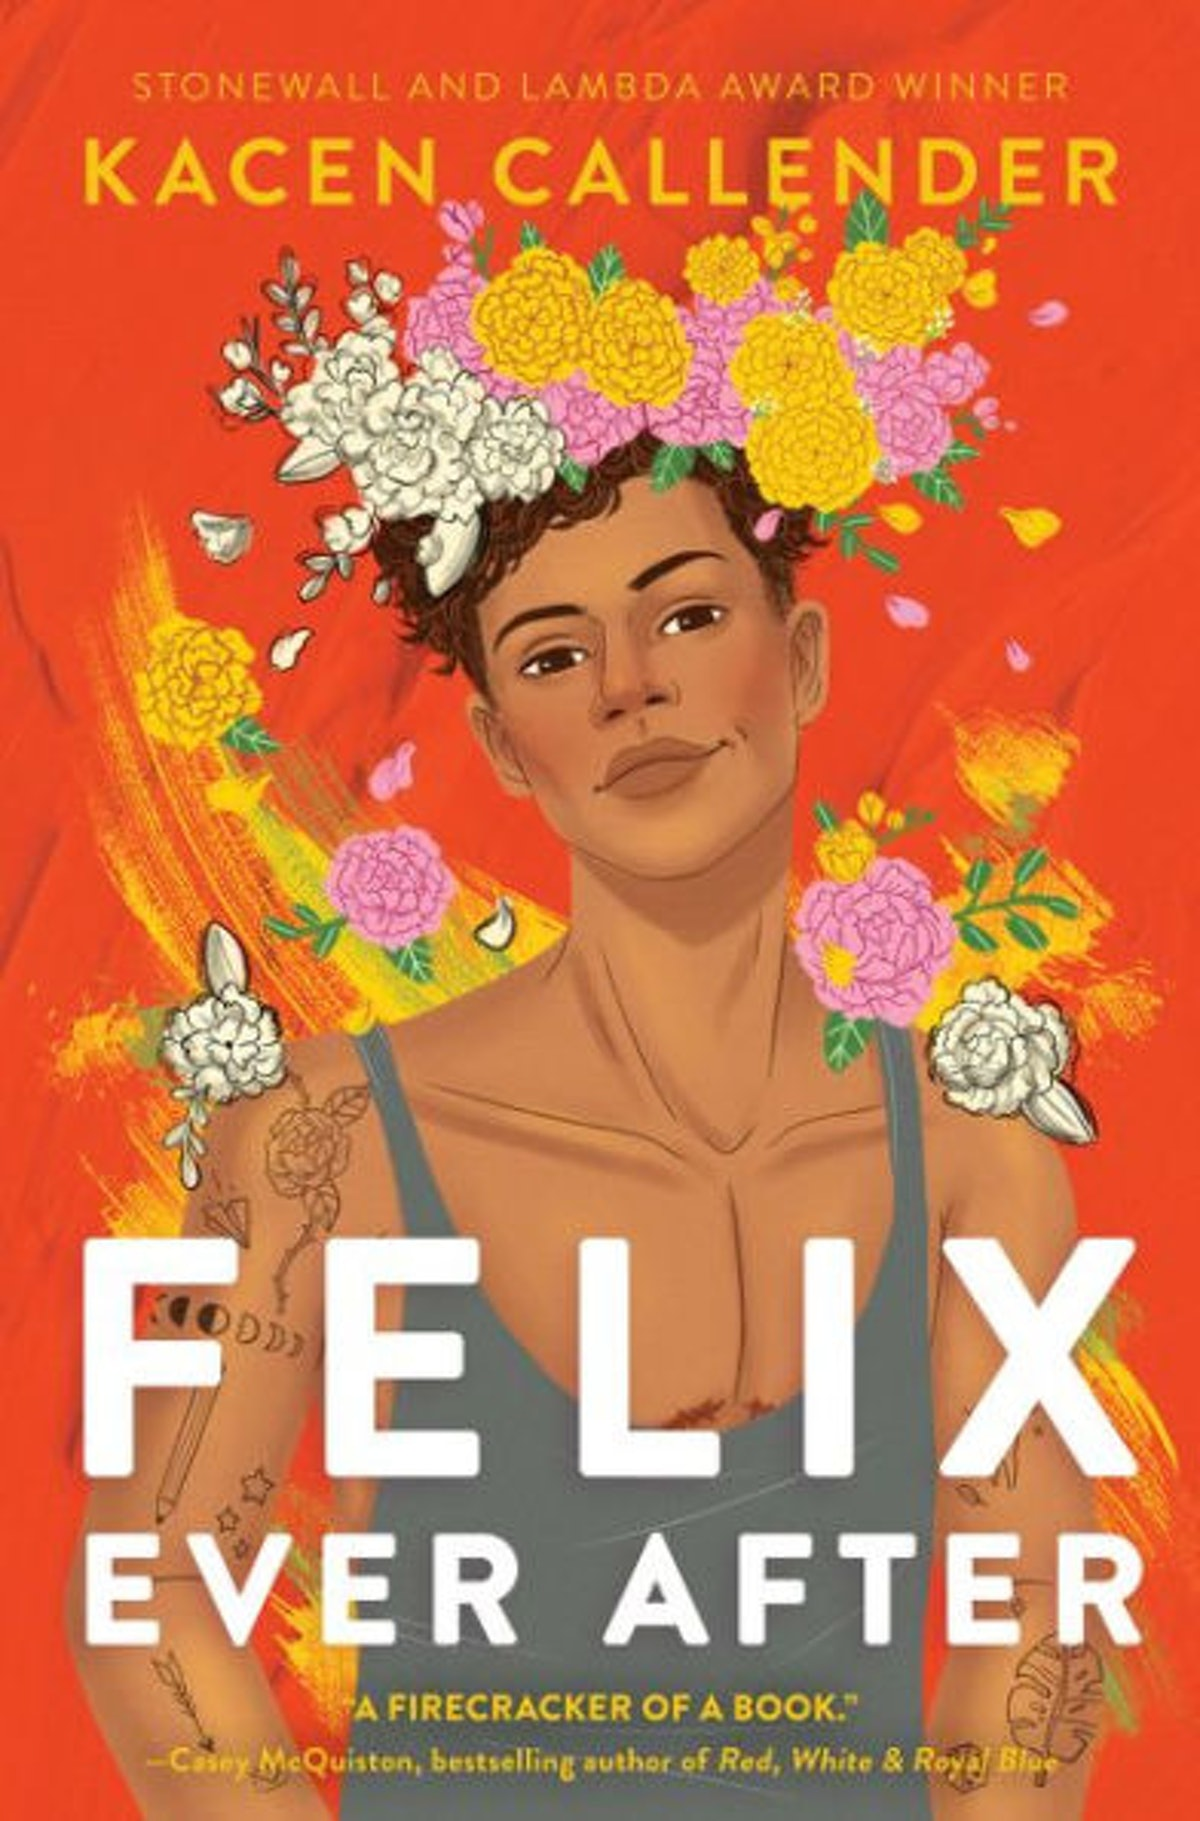 'Felix Ever After' by Kacen Callender